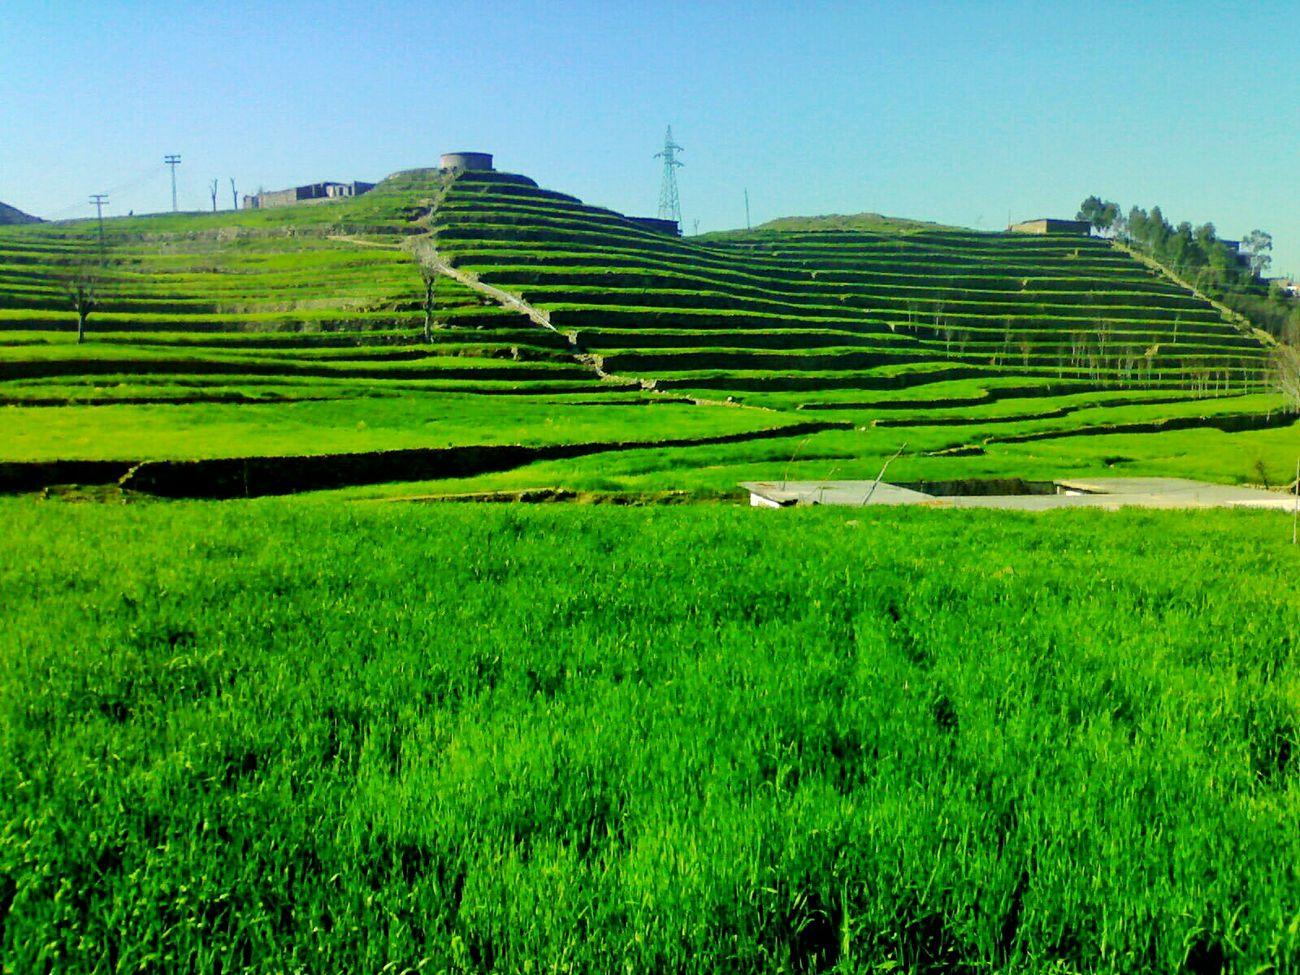 Timergara Dir KhyberPakhtoonkhawa Pakistan Fields Fieldscape Taking Photos Mountains Landscape_photography Landscapes